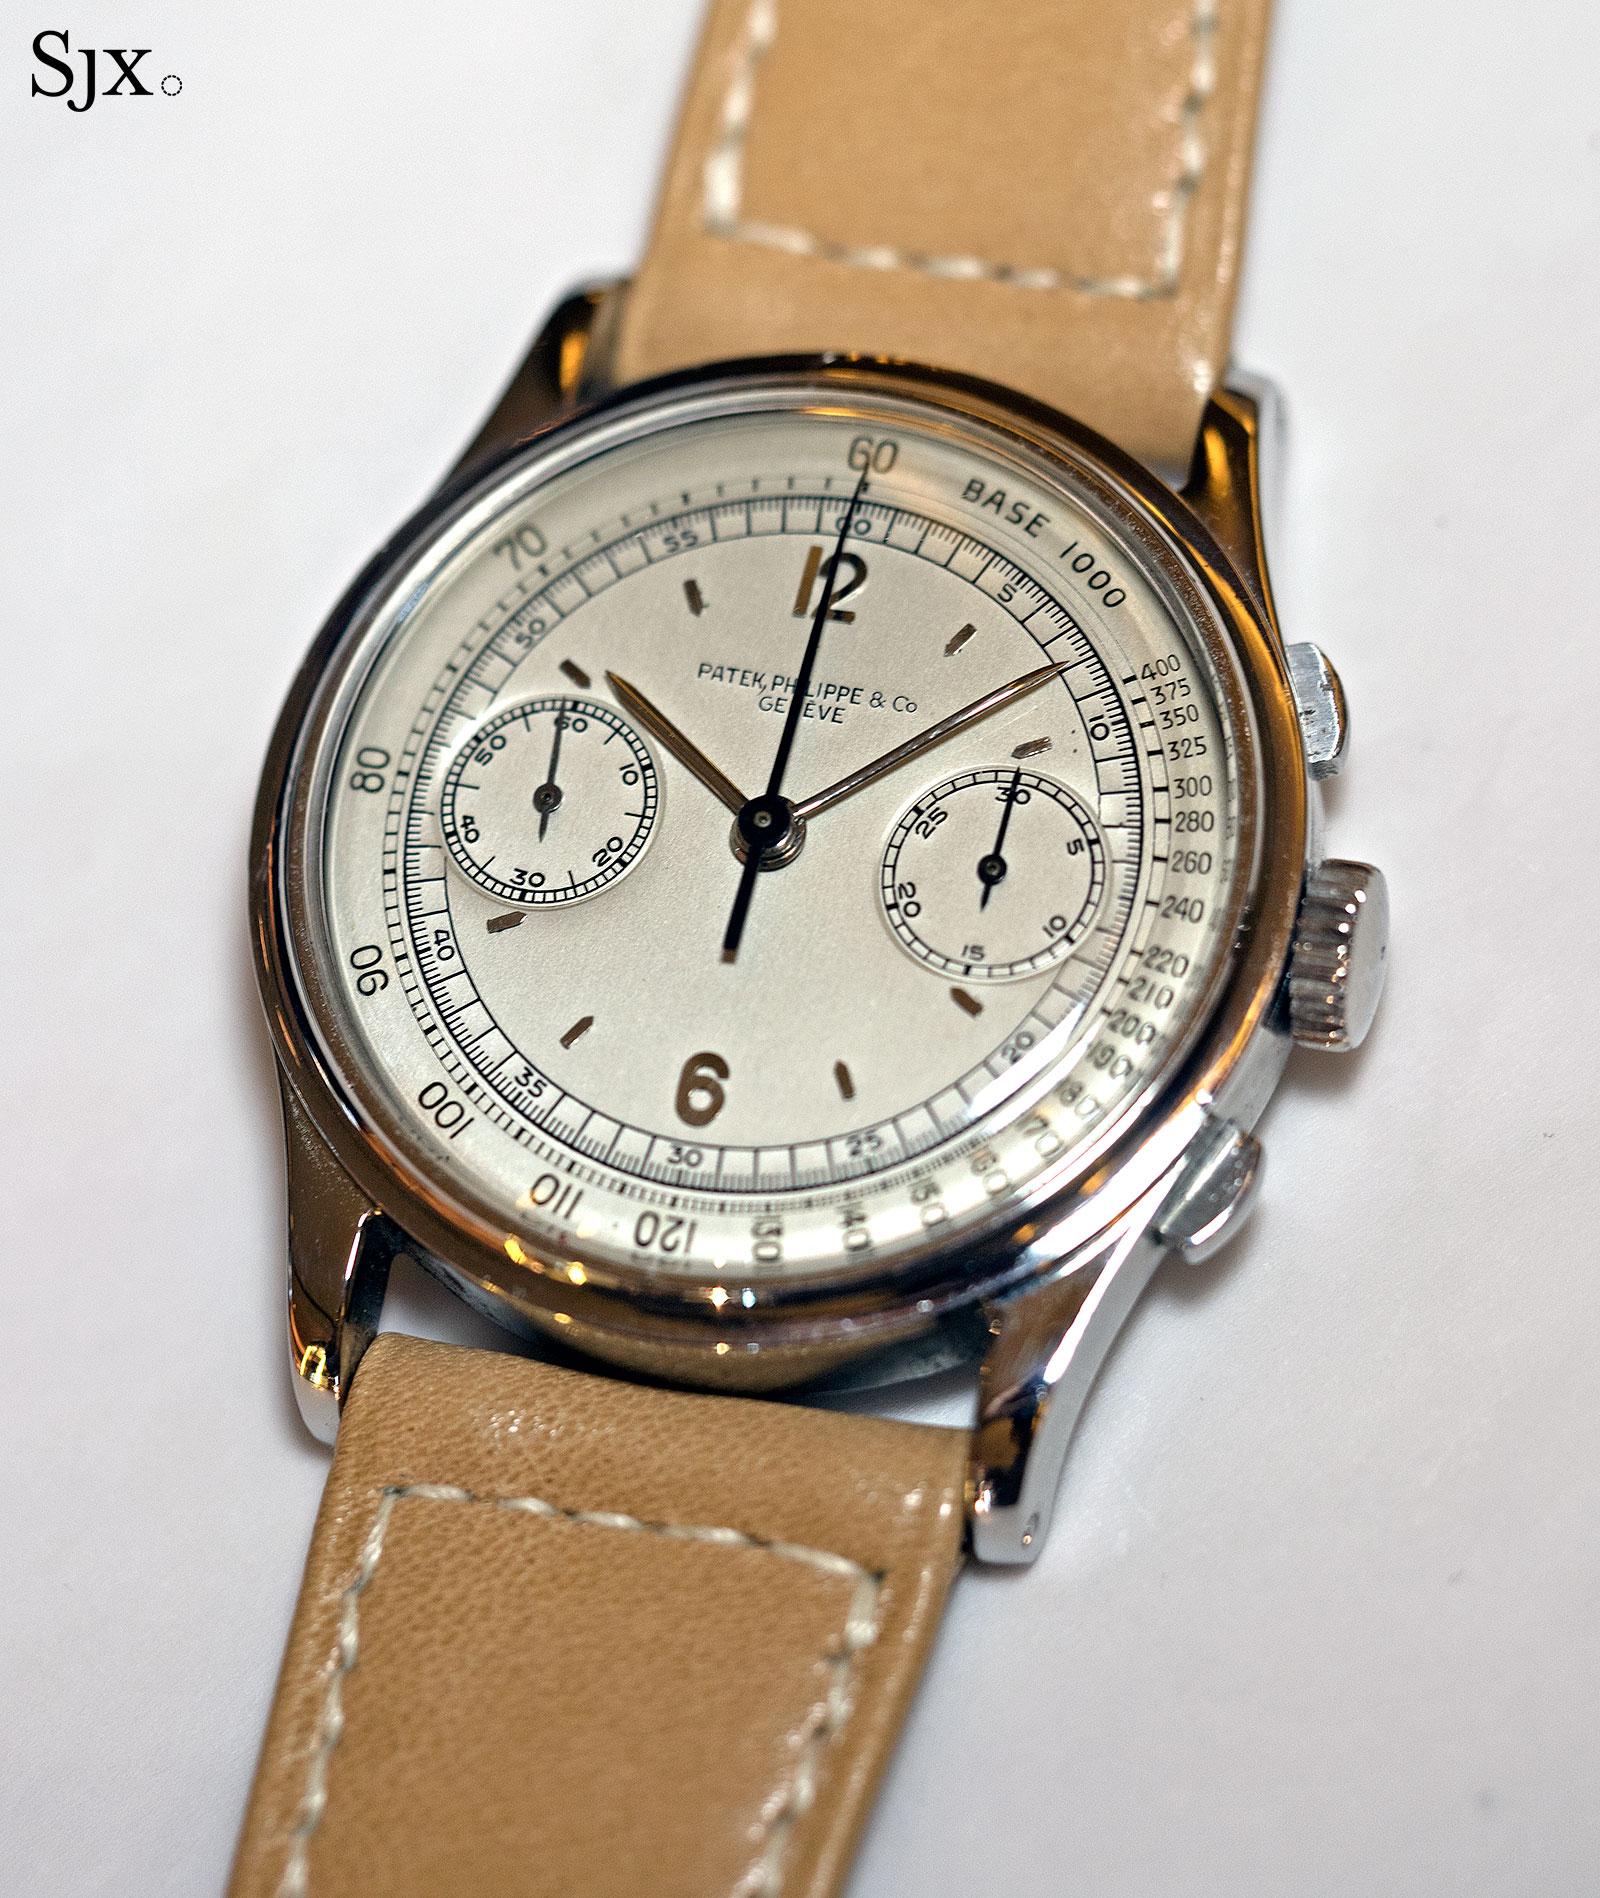 Patek Philippe 530 chronograph steel 1